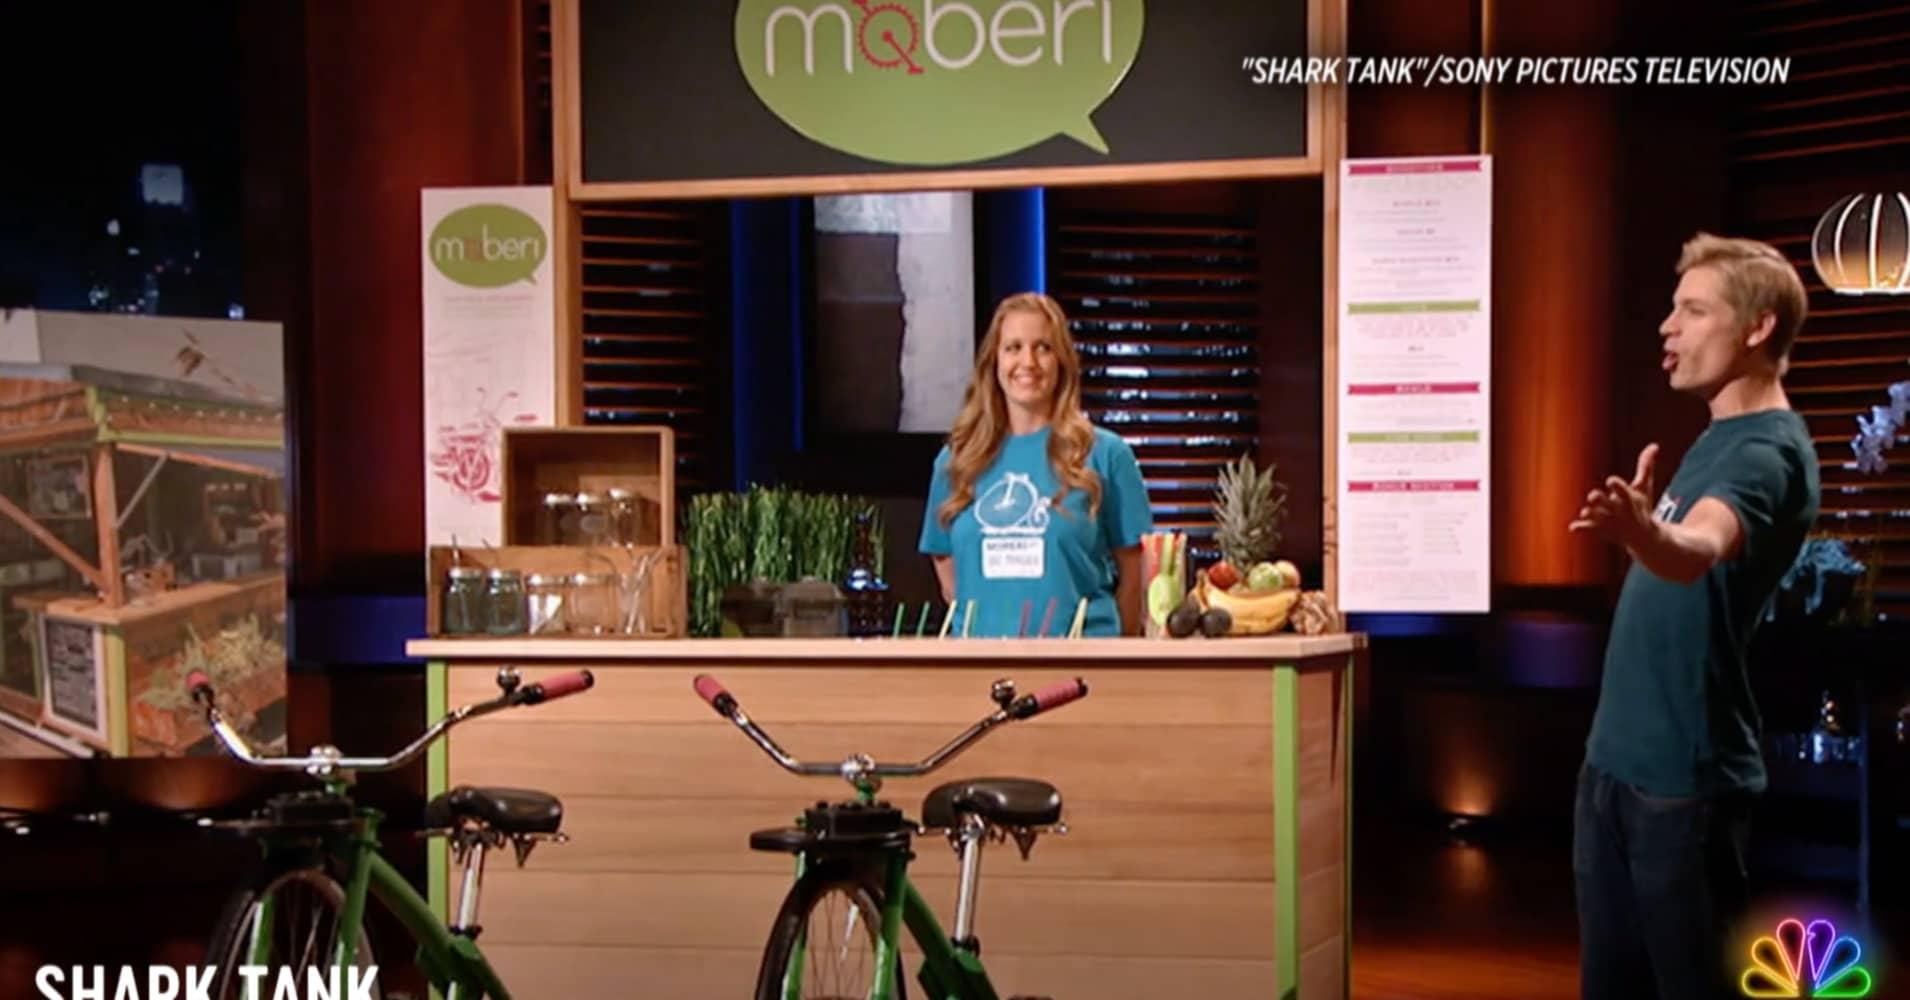 A 'Shark Tank' entrepreneur pitches his bike-blending smoothie bar